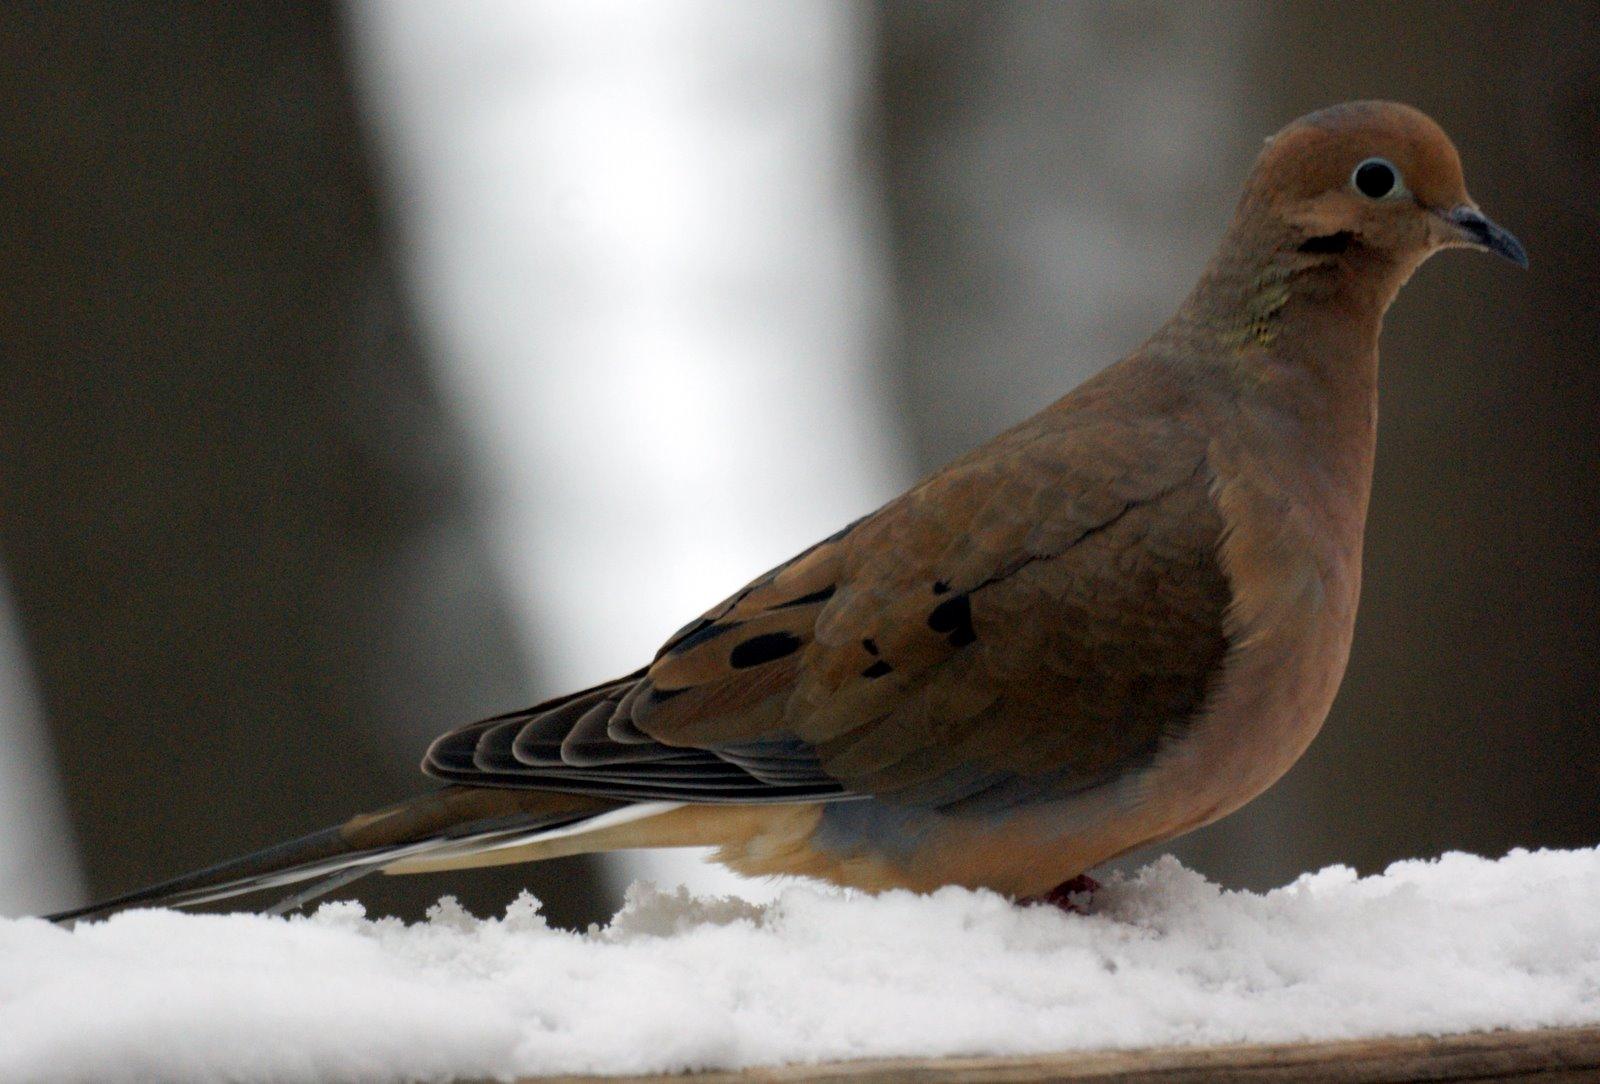 nj bird photos birds of new jersey january 18 2009